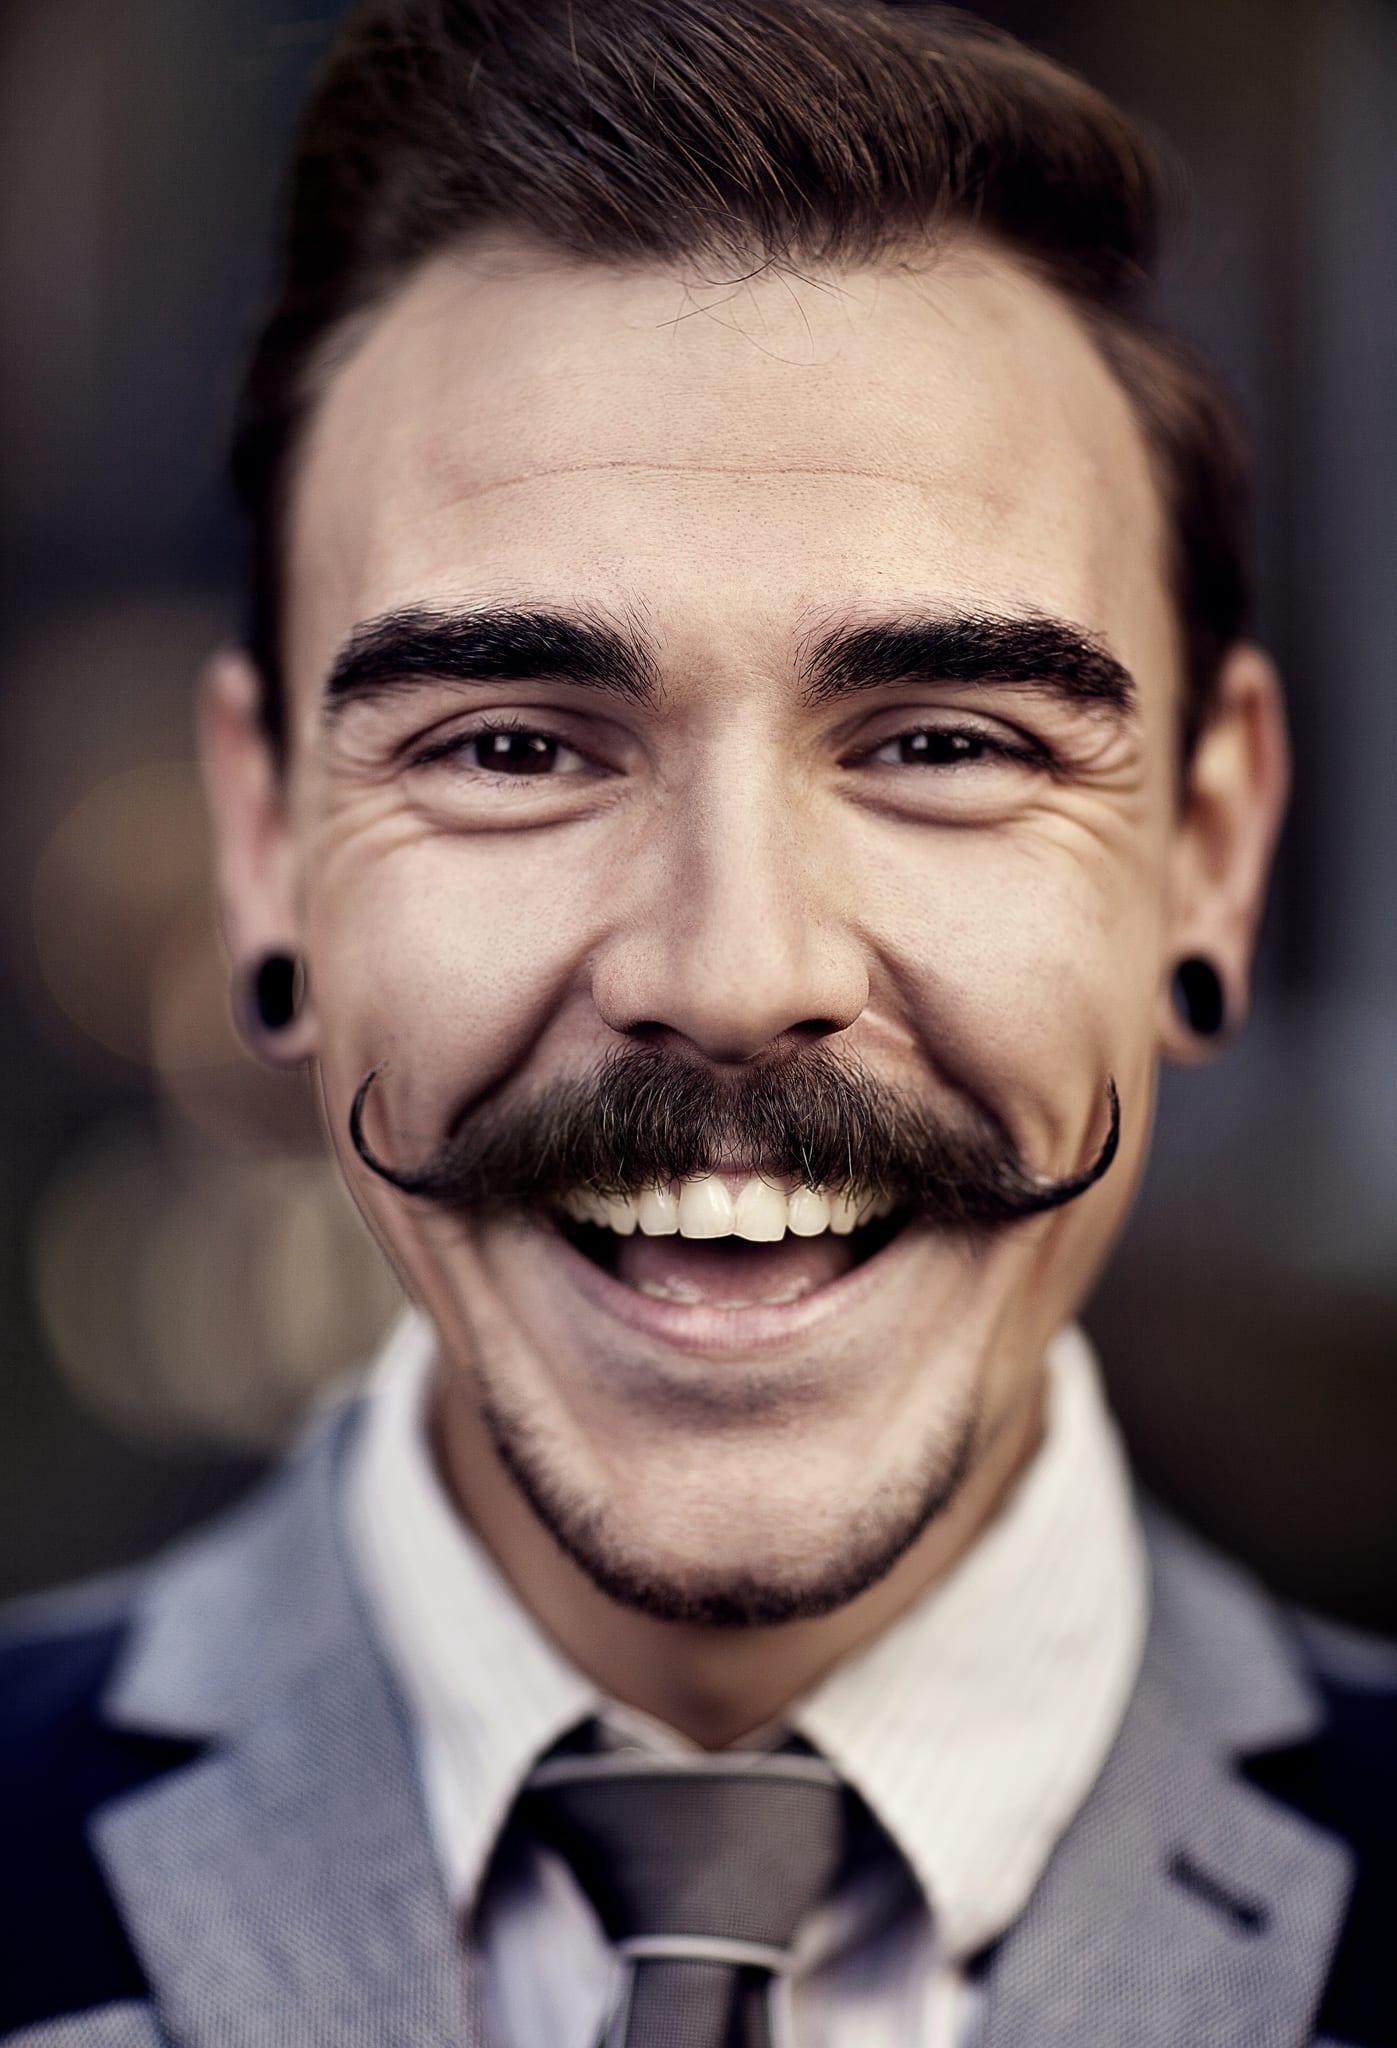 Moustache-Facial Hair Styles for men